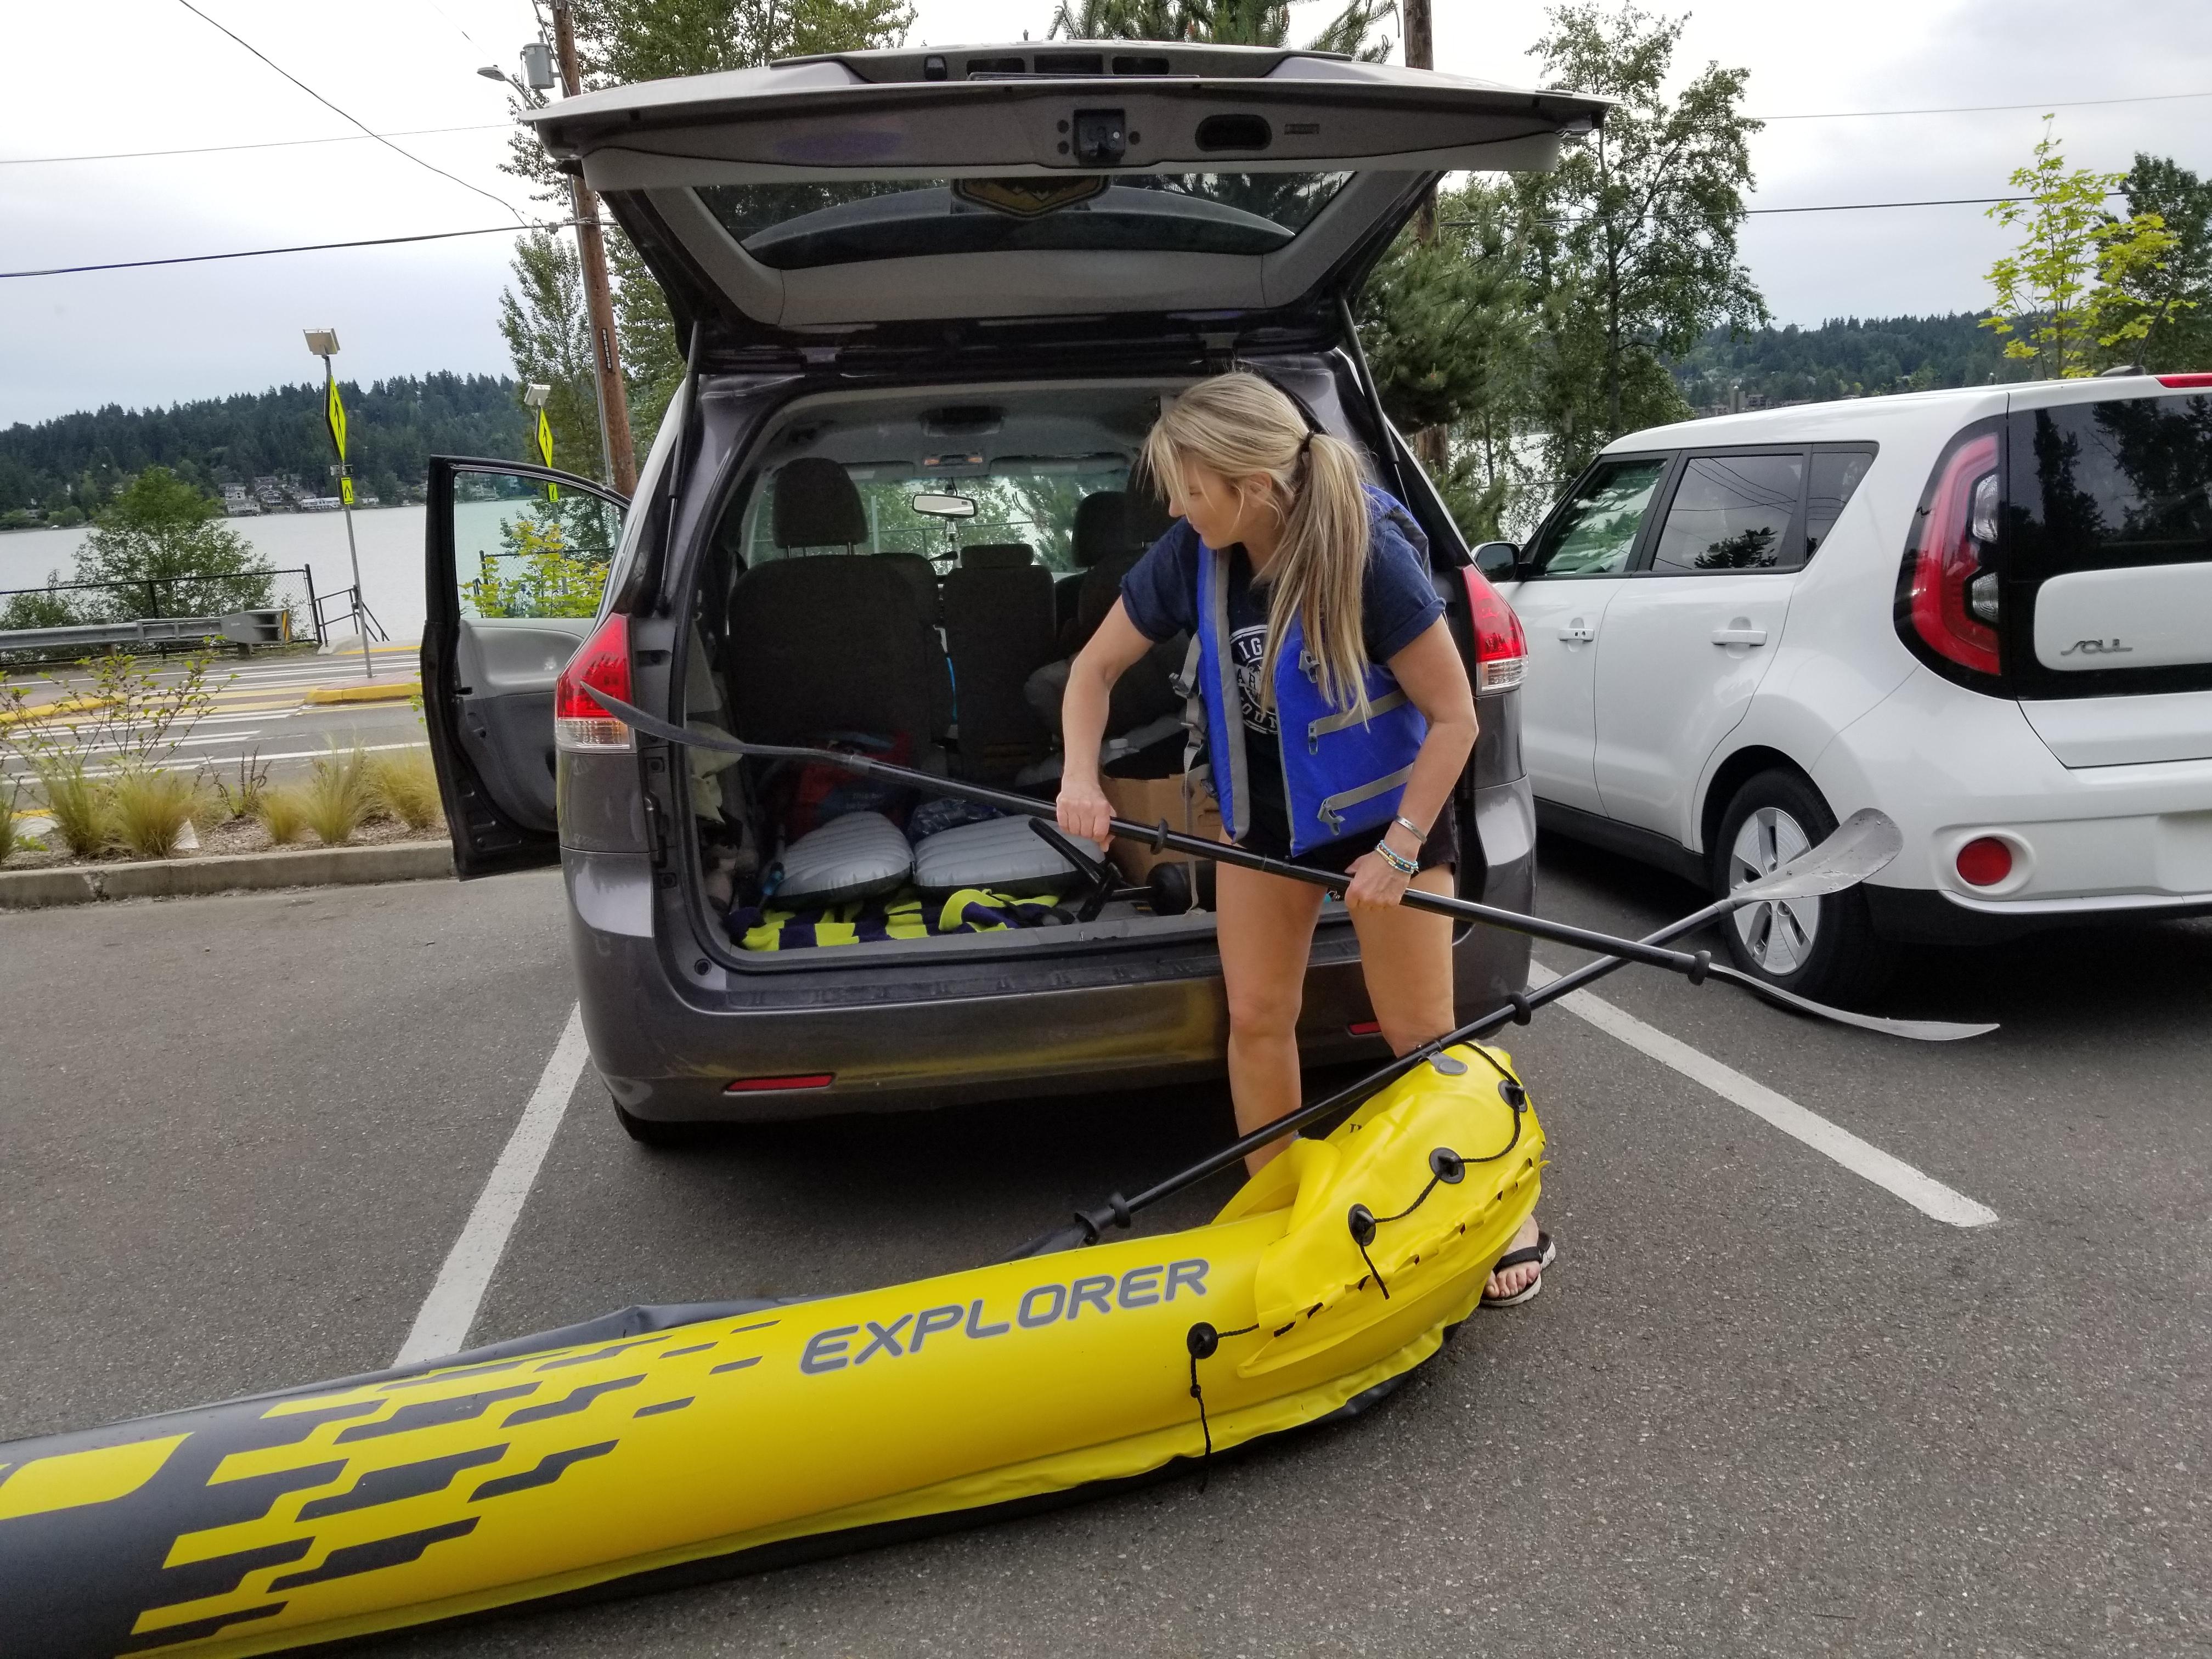 Kayak Lake Cleanup